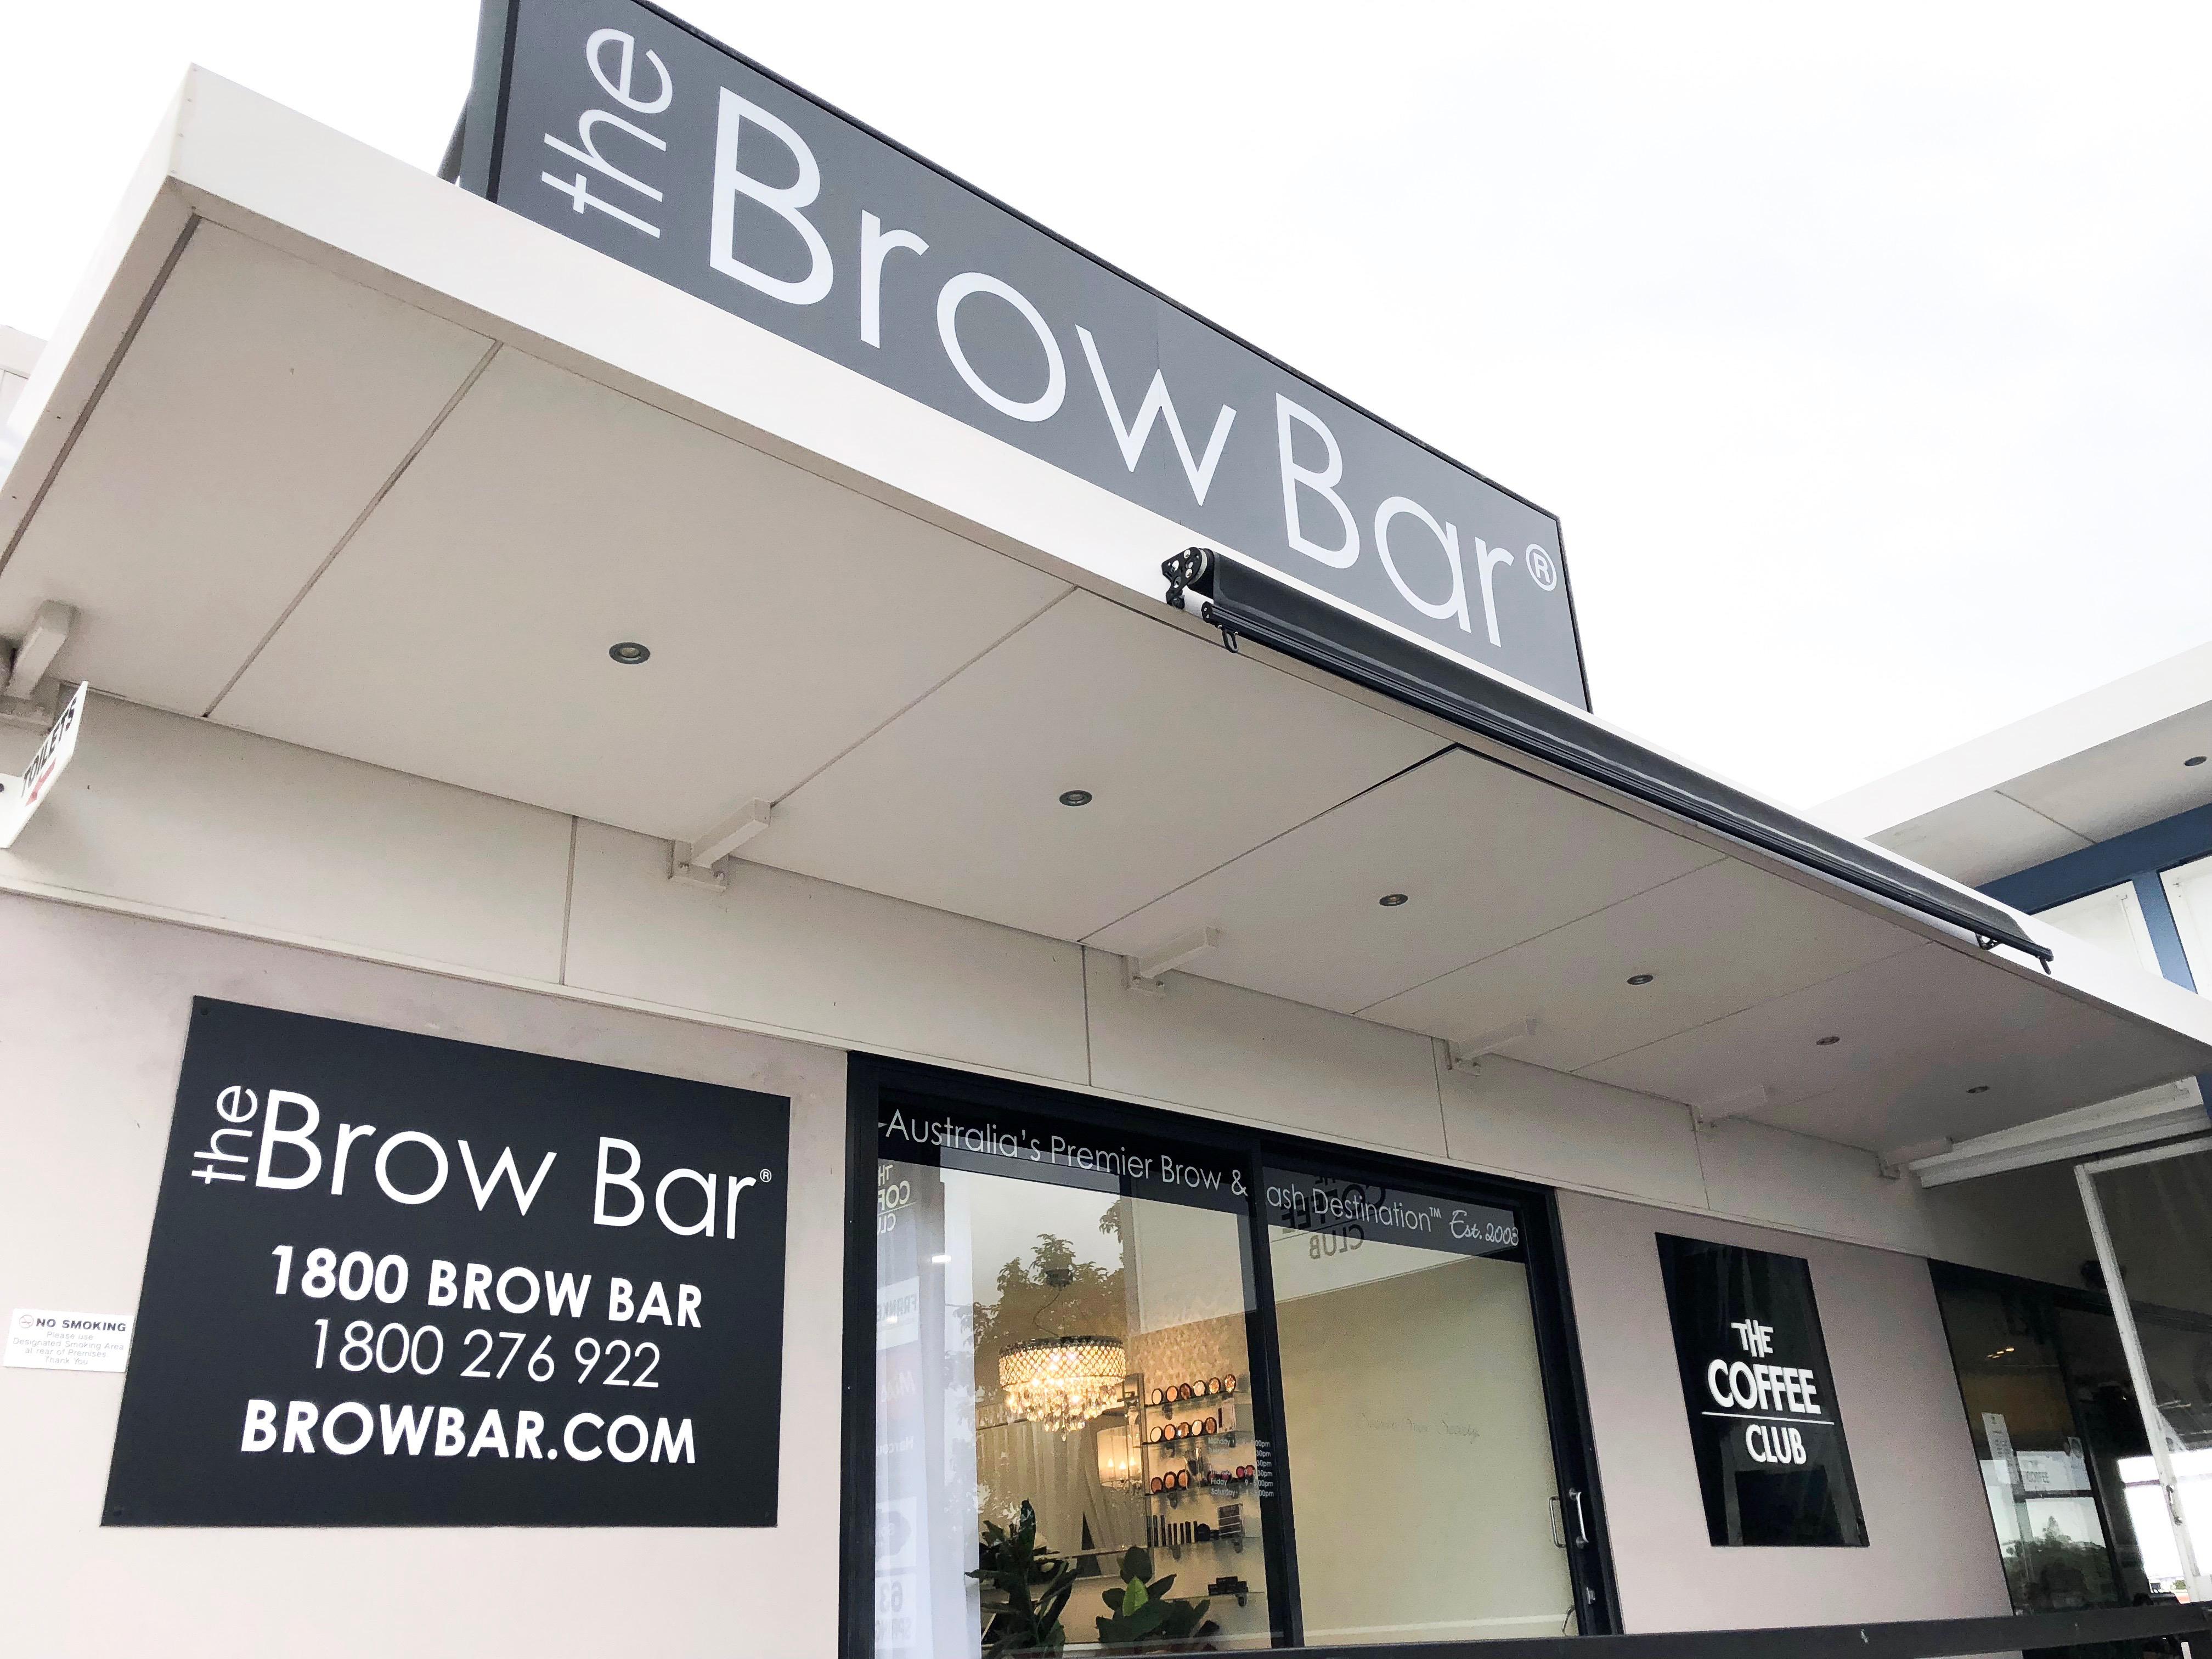 cac77281ab5 Springwood, Brisbane Brow and Lash Bar for sale in Springwood QLD, 4127 |  SEEK Business